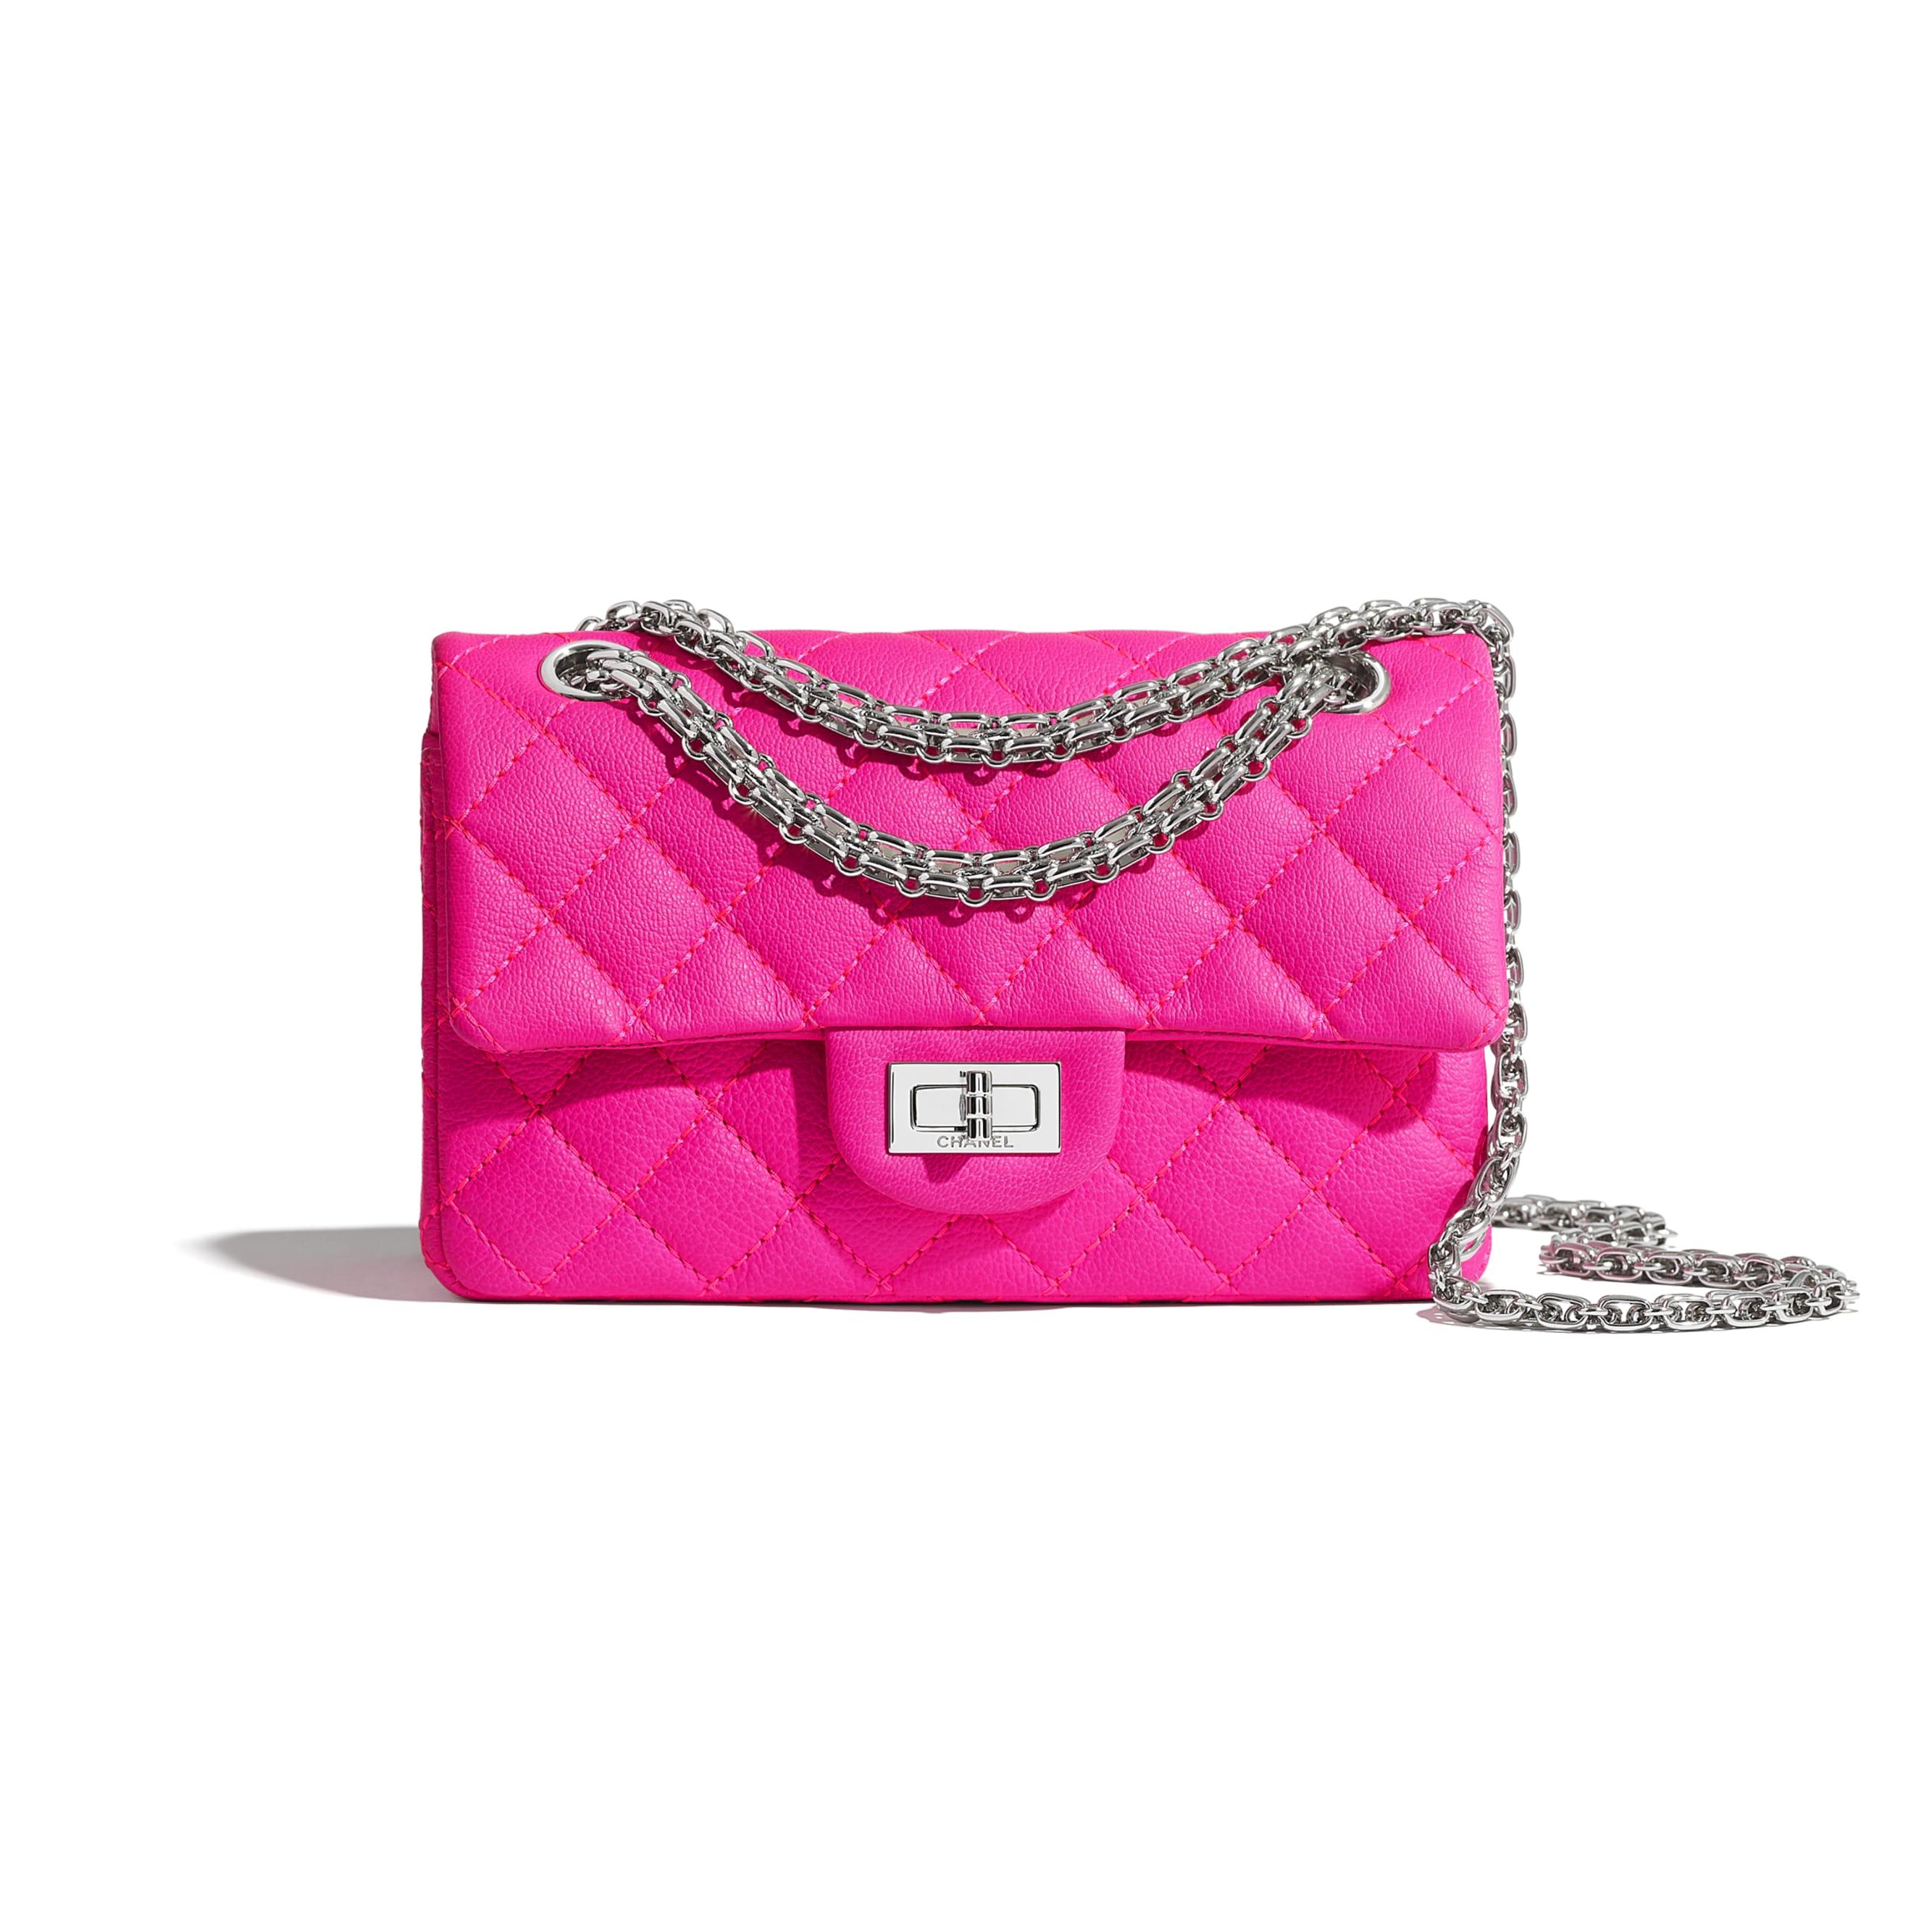 Mini 2.55 Handbag - Pink - Goatskin & Silver-Tone Metal - CHANEL - Default view - see standard sized version